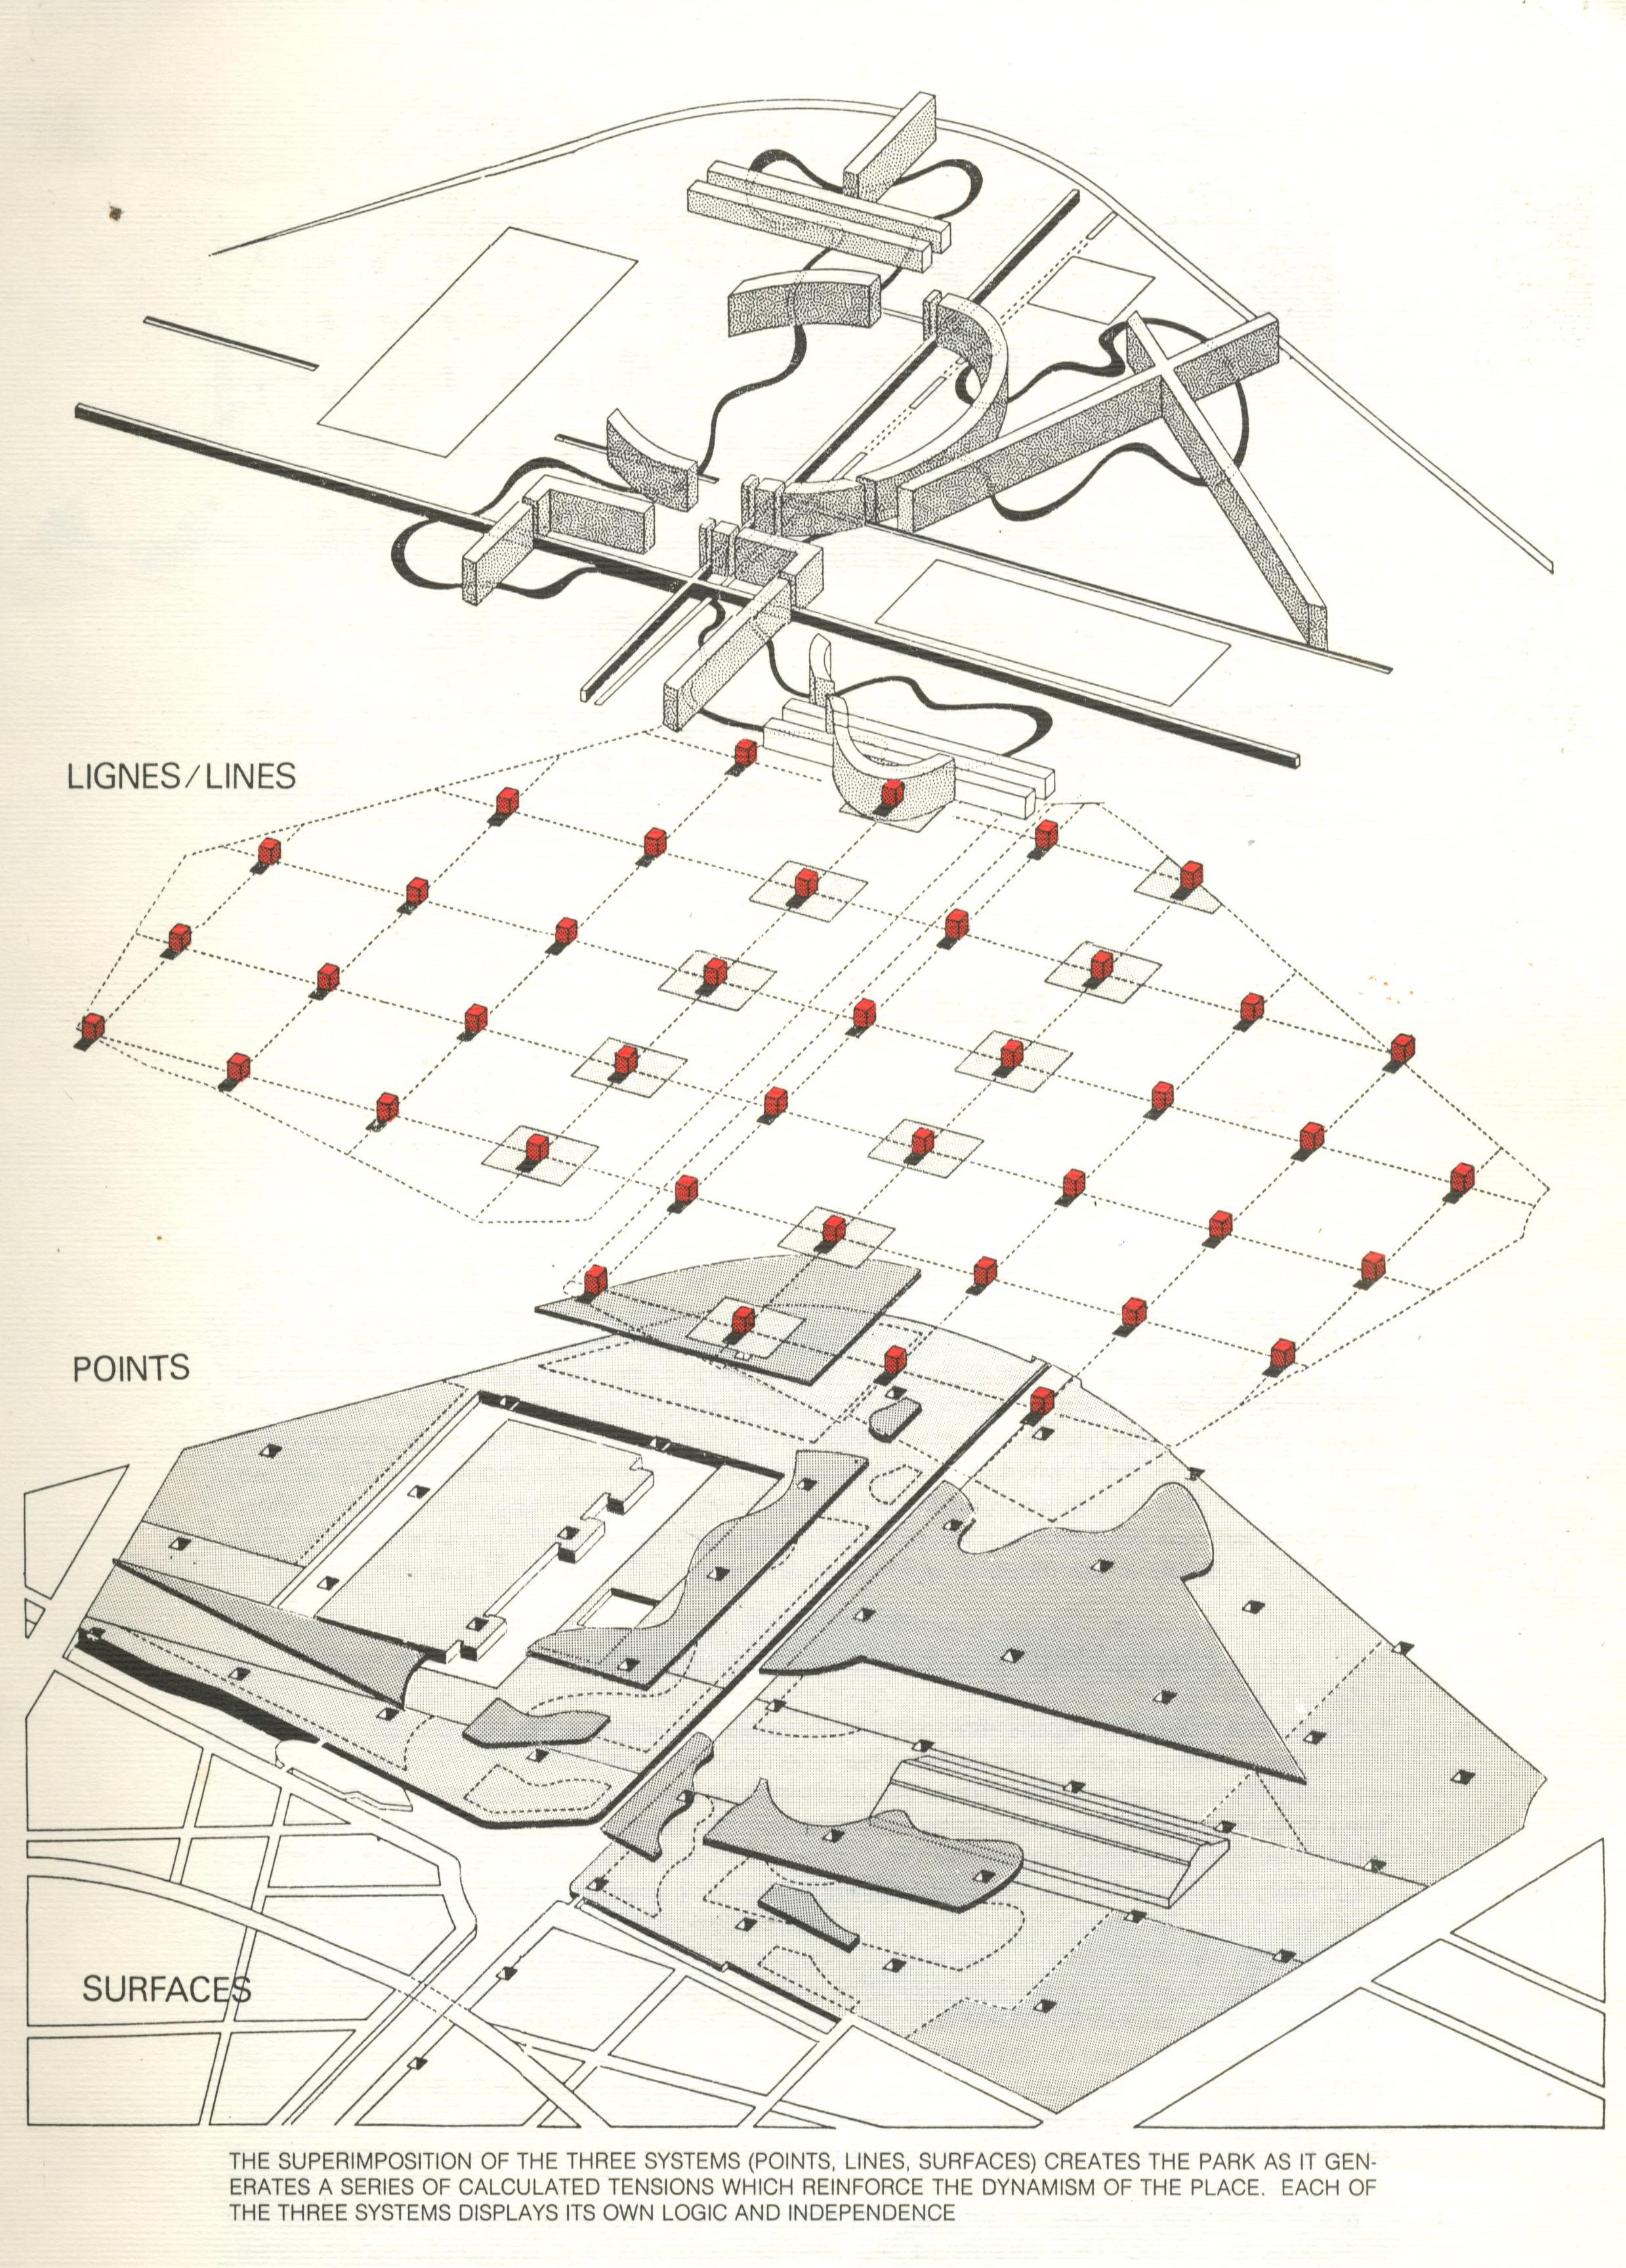 oma parc de la villette diagram 2003 jetta tail light wiring 2013 relational space essay suzanne o 39donovan